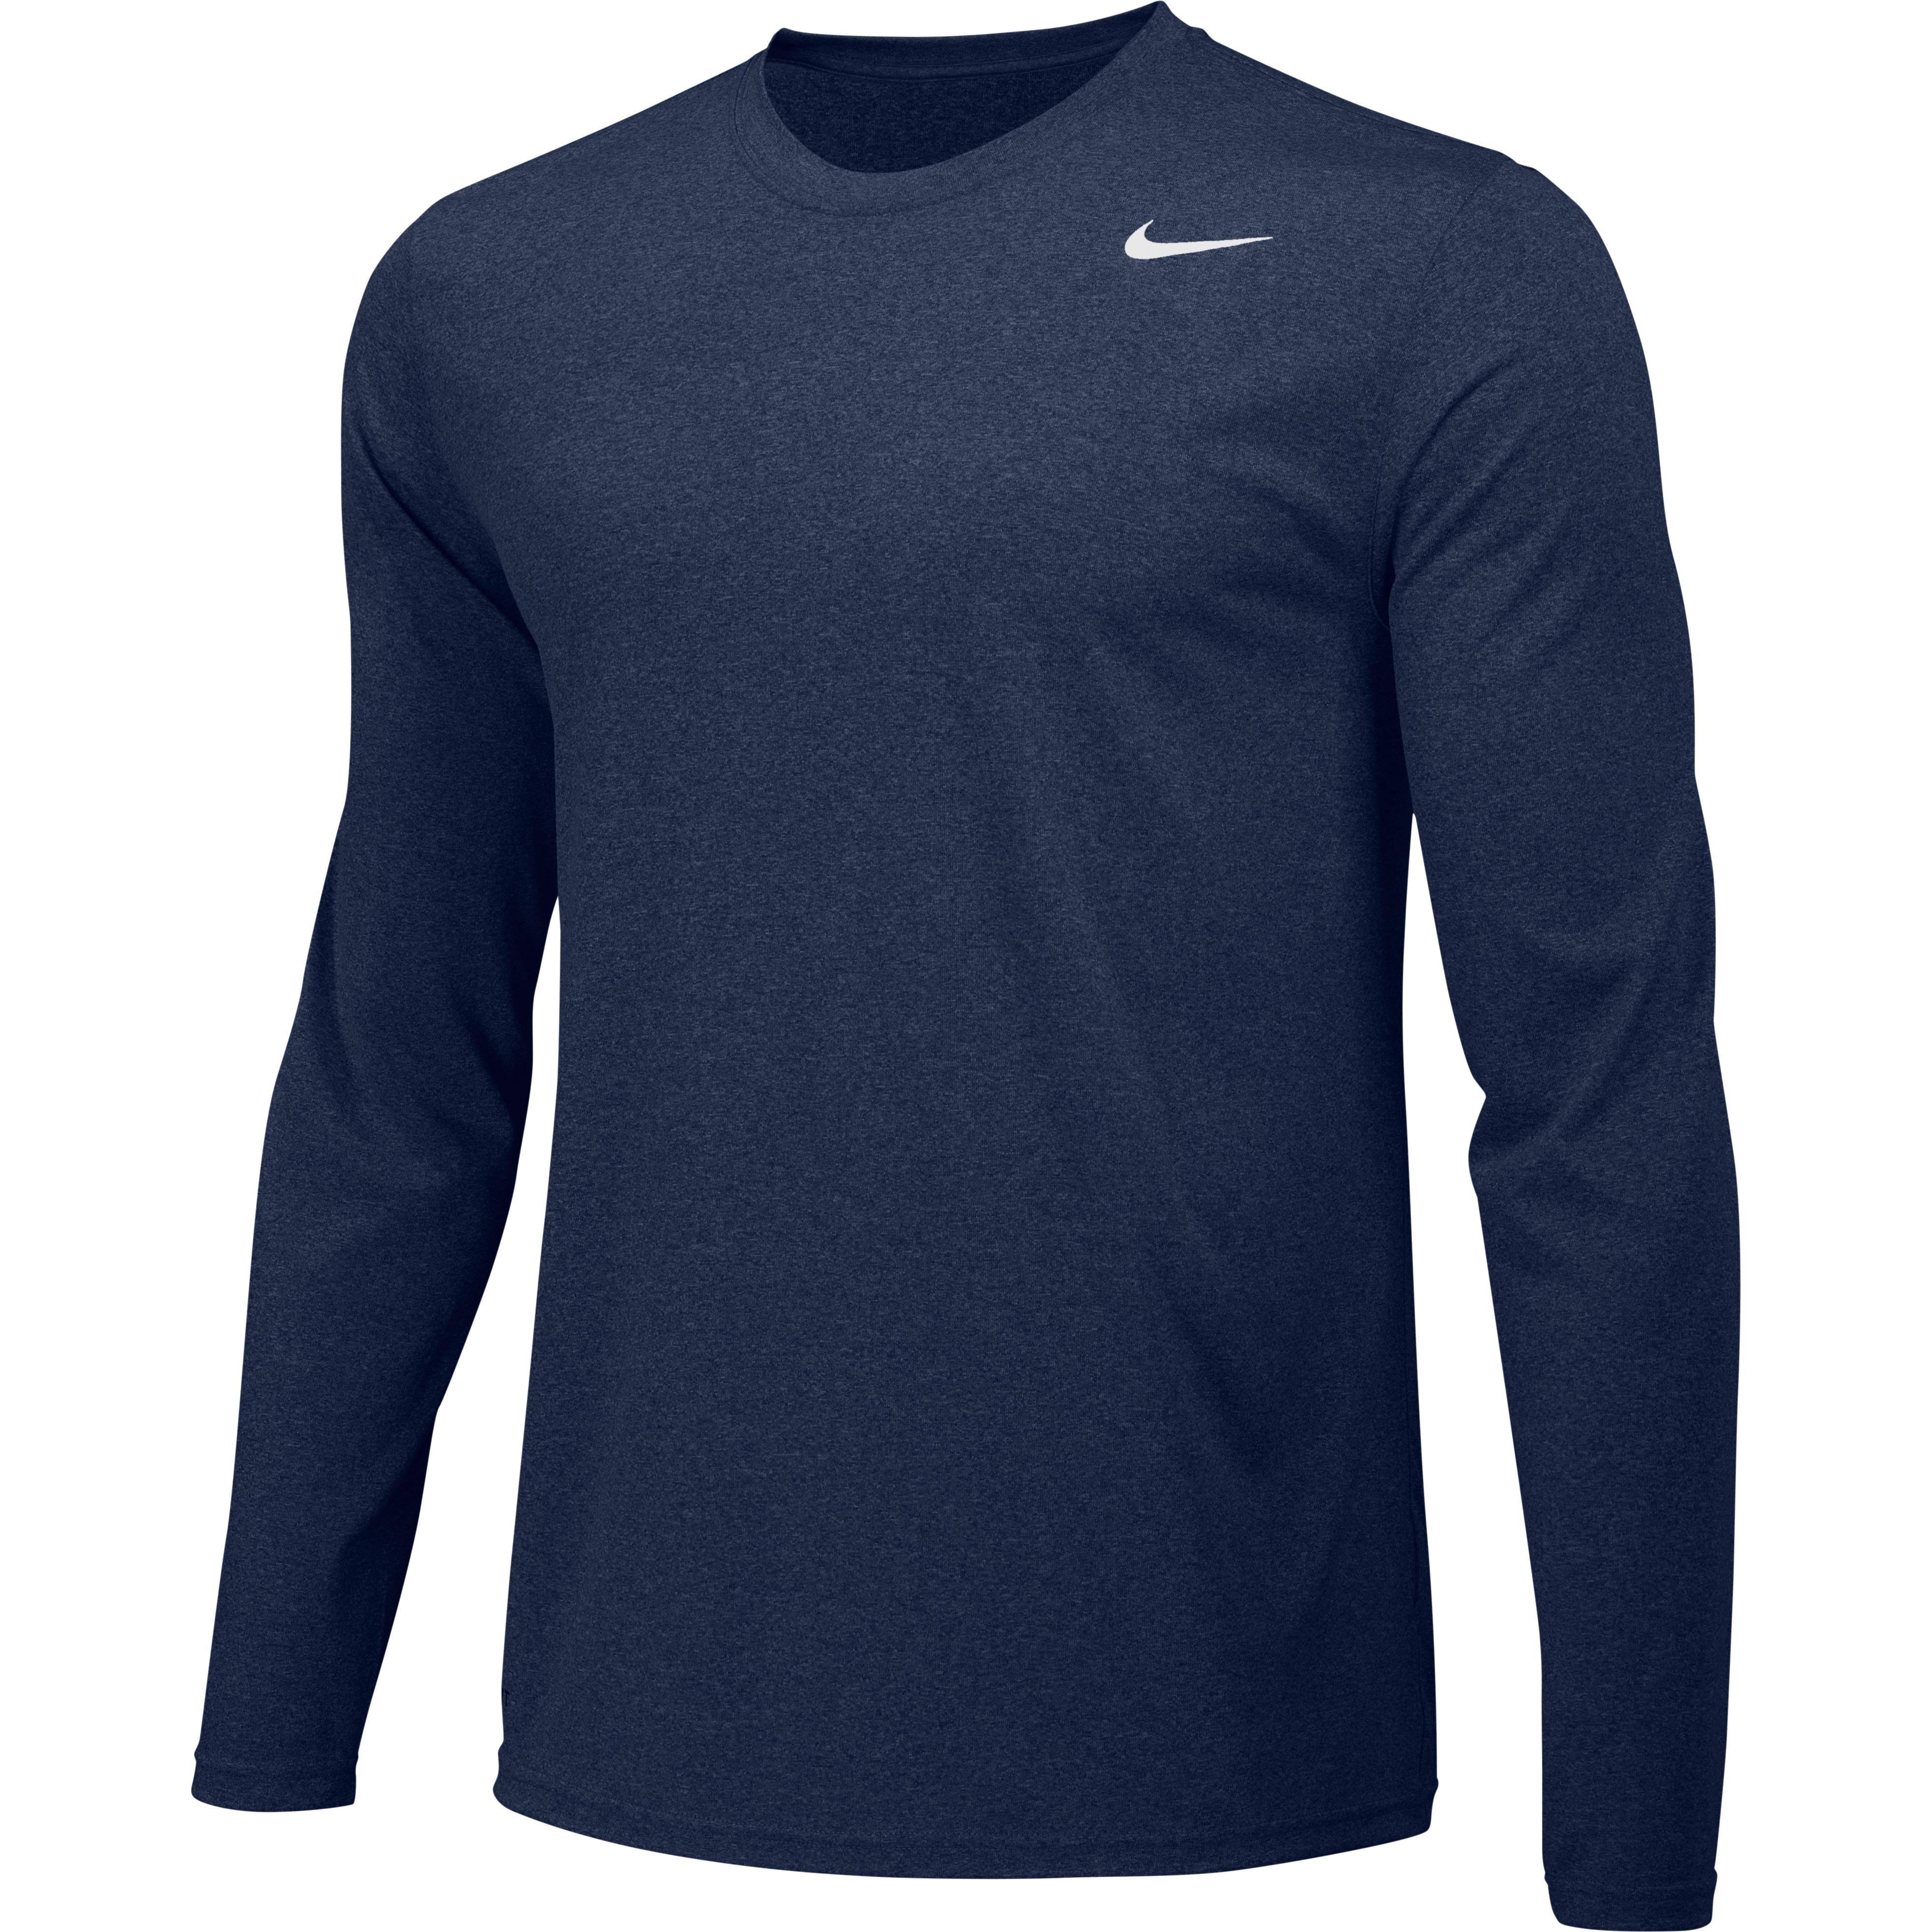 Larga Boy Nike De Pequeña Regular Manga Camiseta Marino Azul Legend Entrenamiento q6twnT1